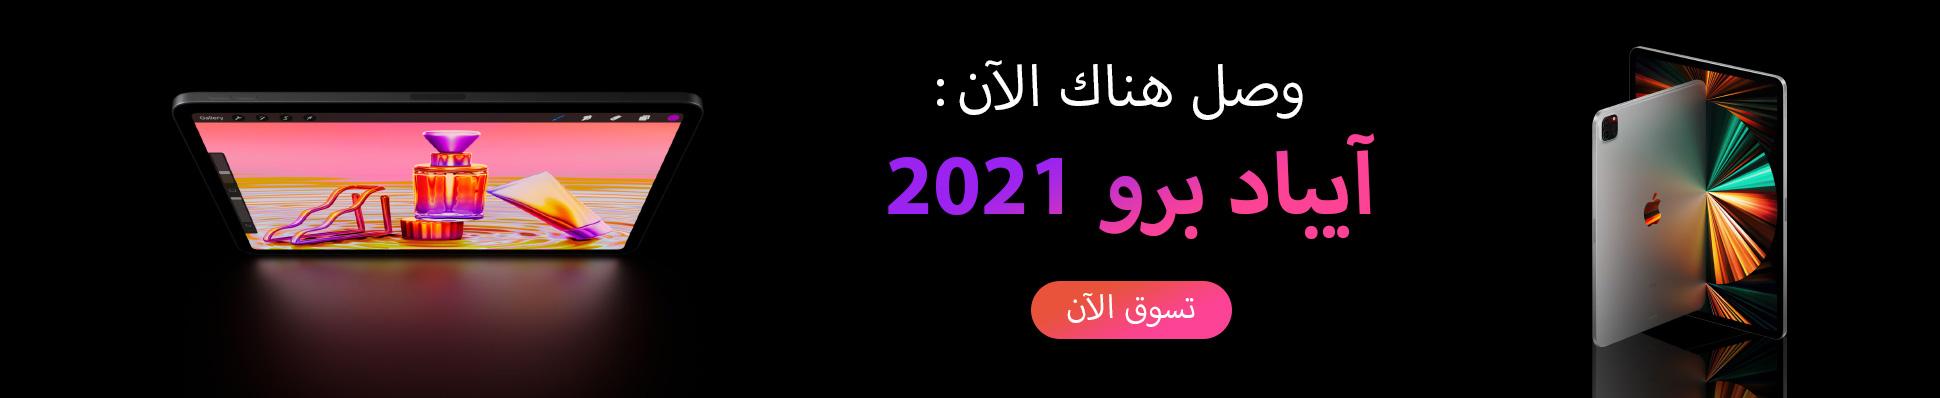 ipad_2021_new_webapp